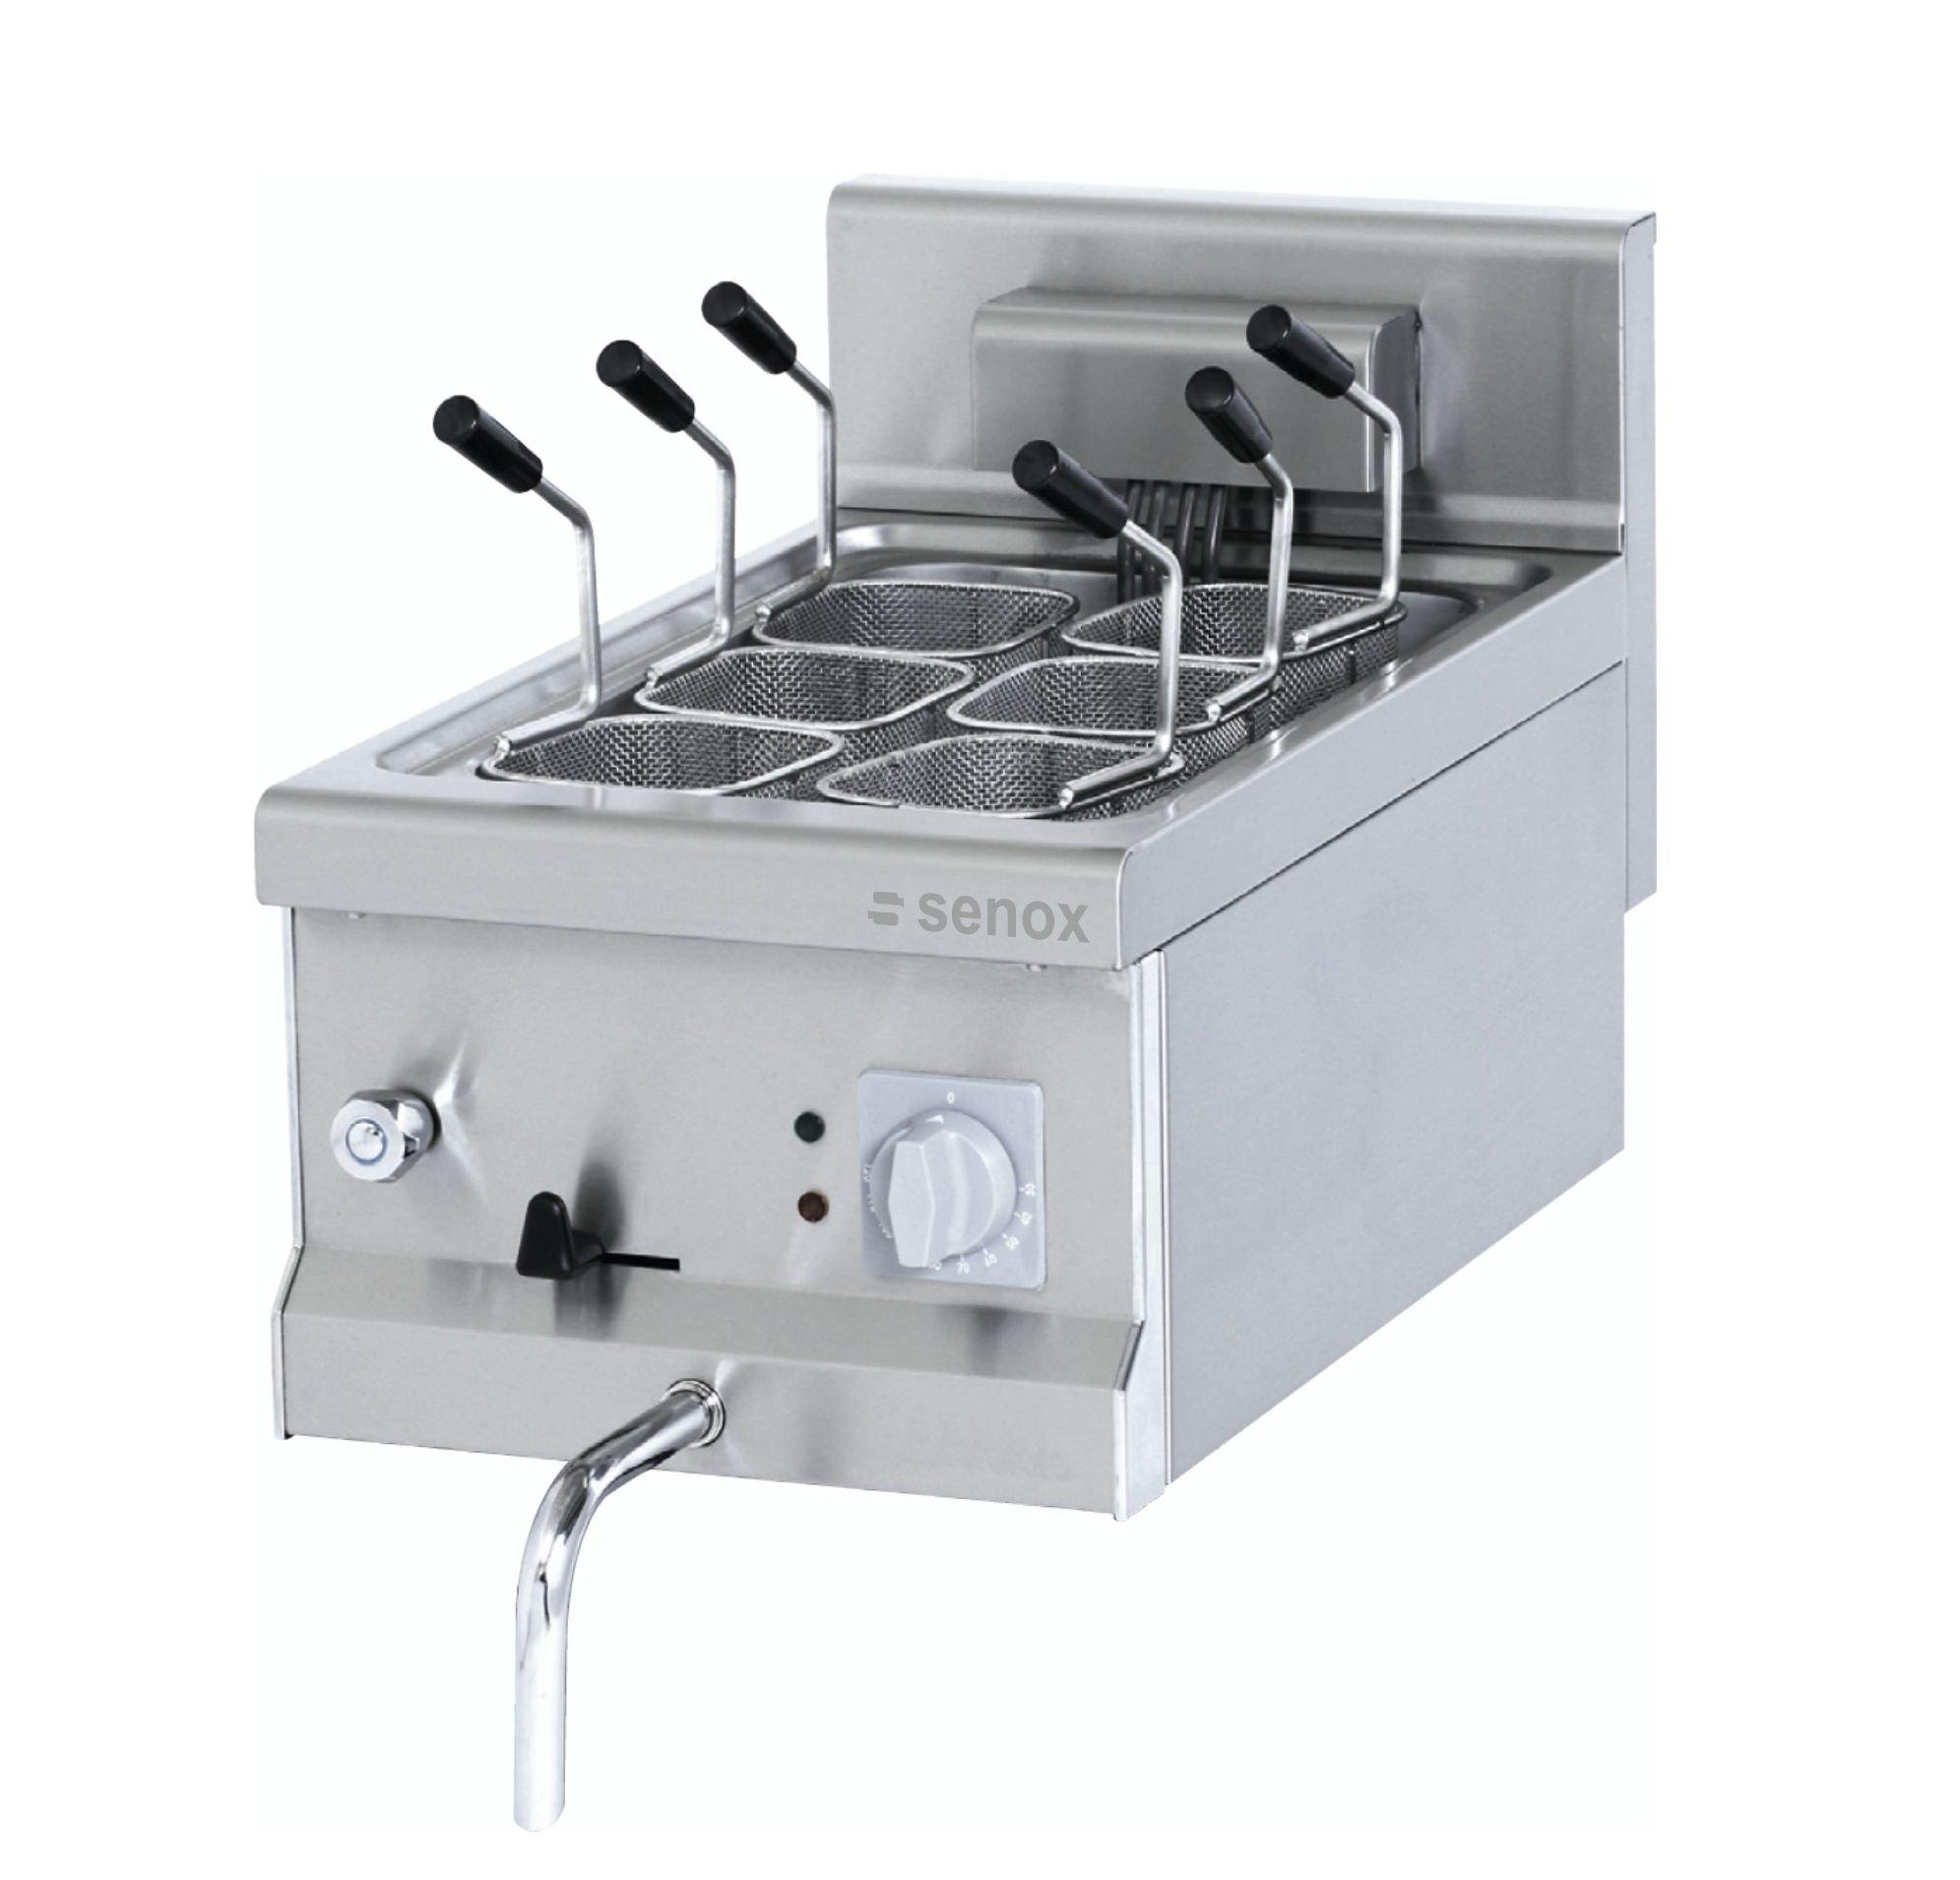 senox-amp-470-makarna-pisirici